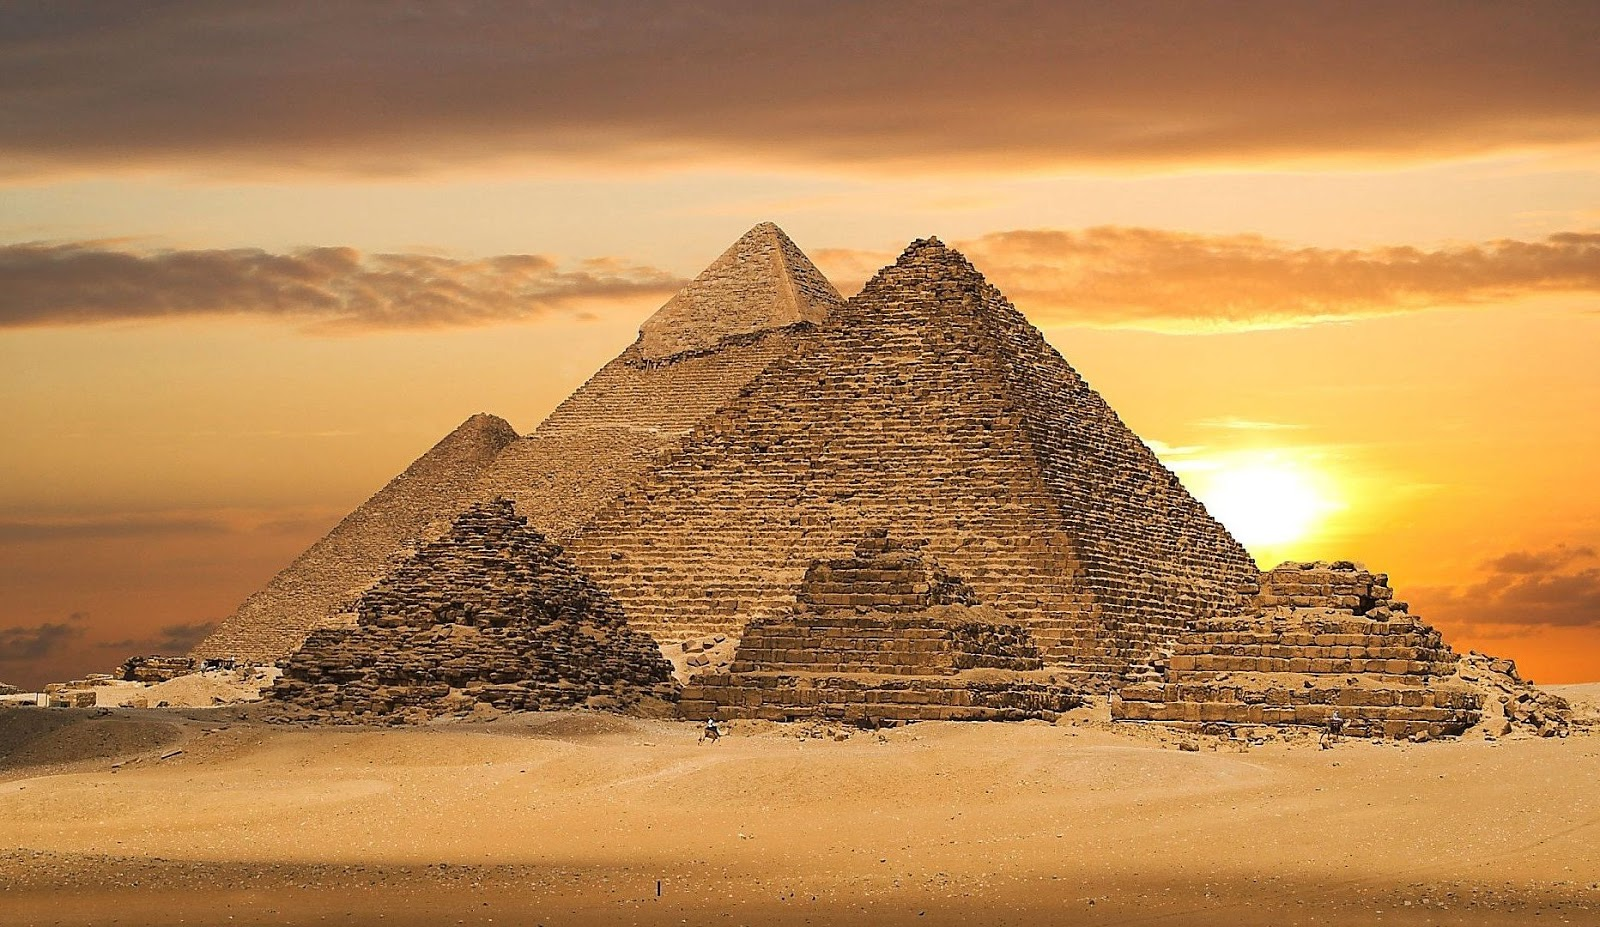 Pyramids-Giza.jpg